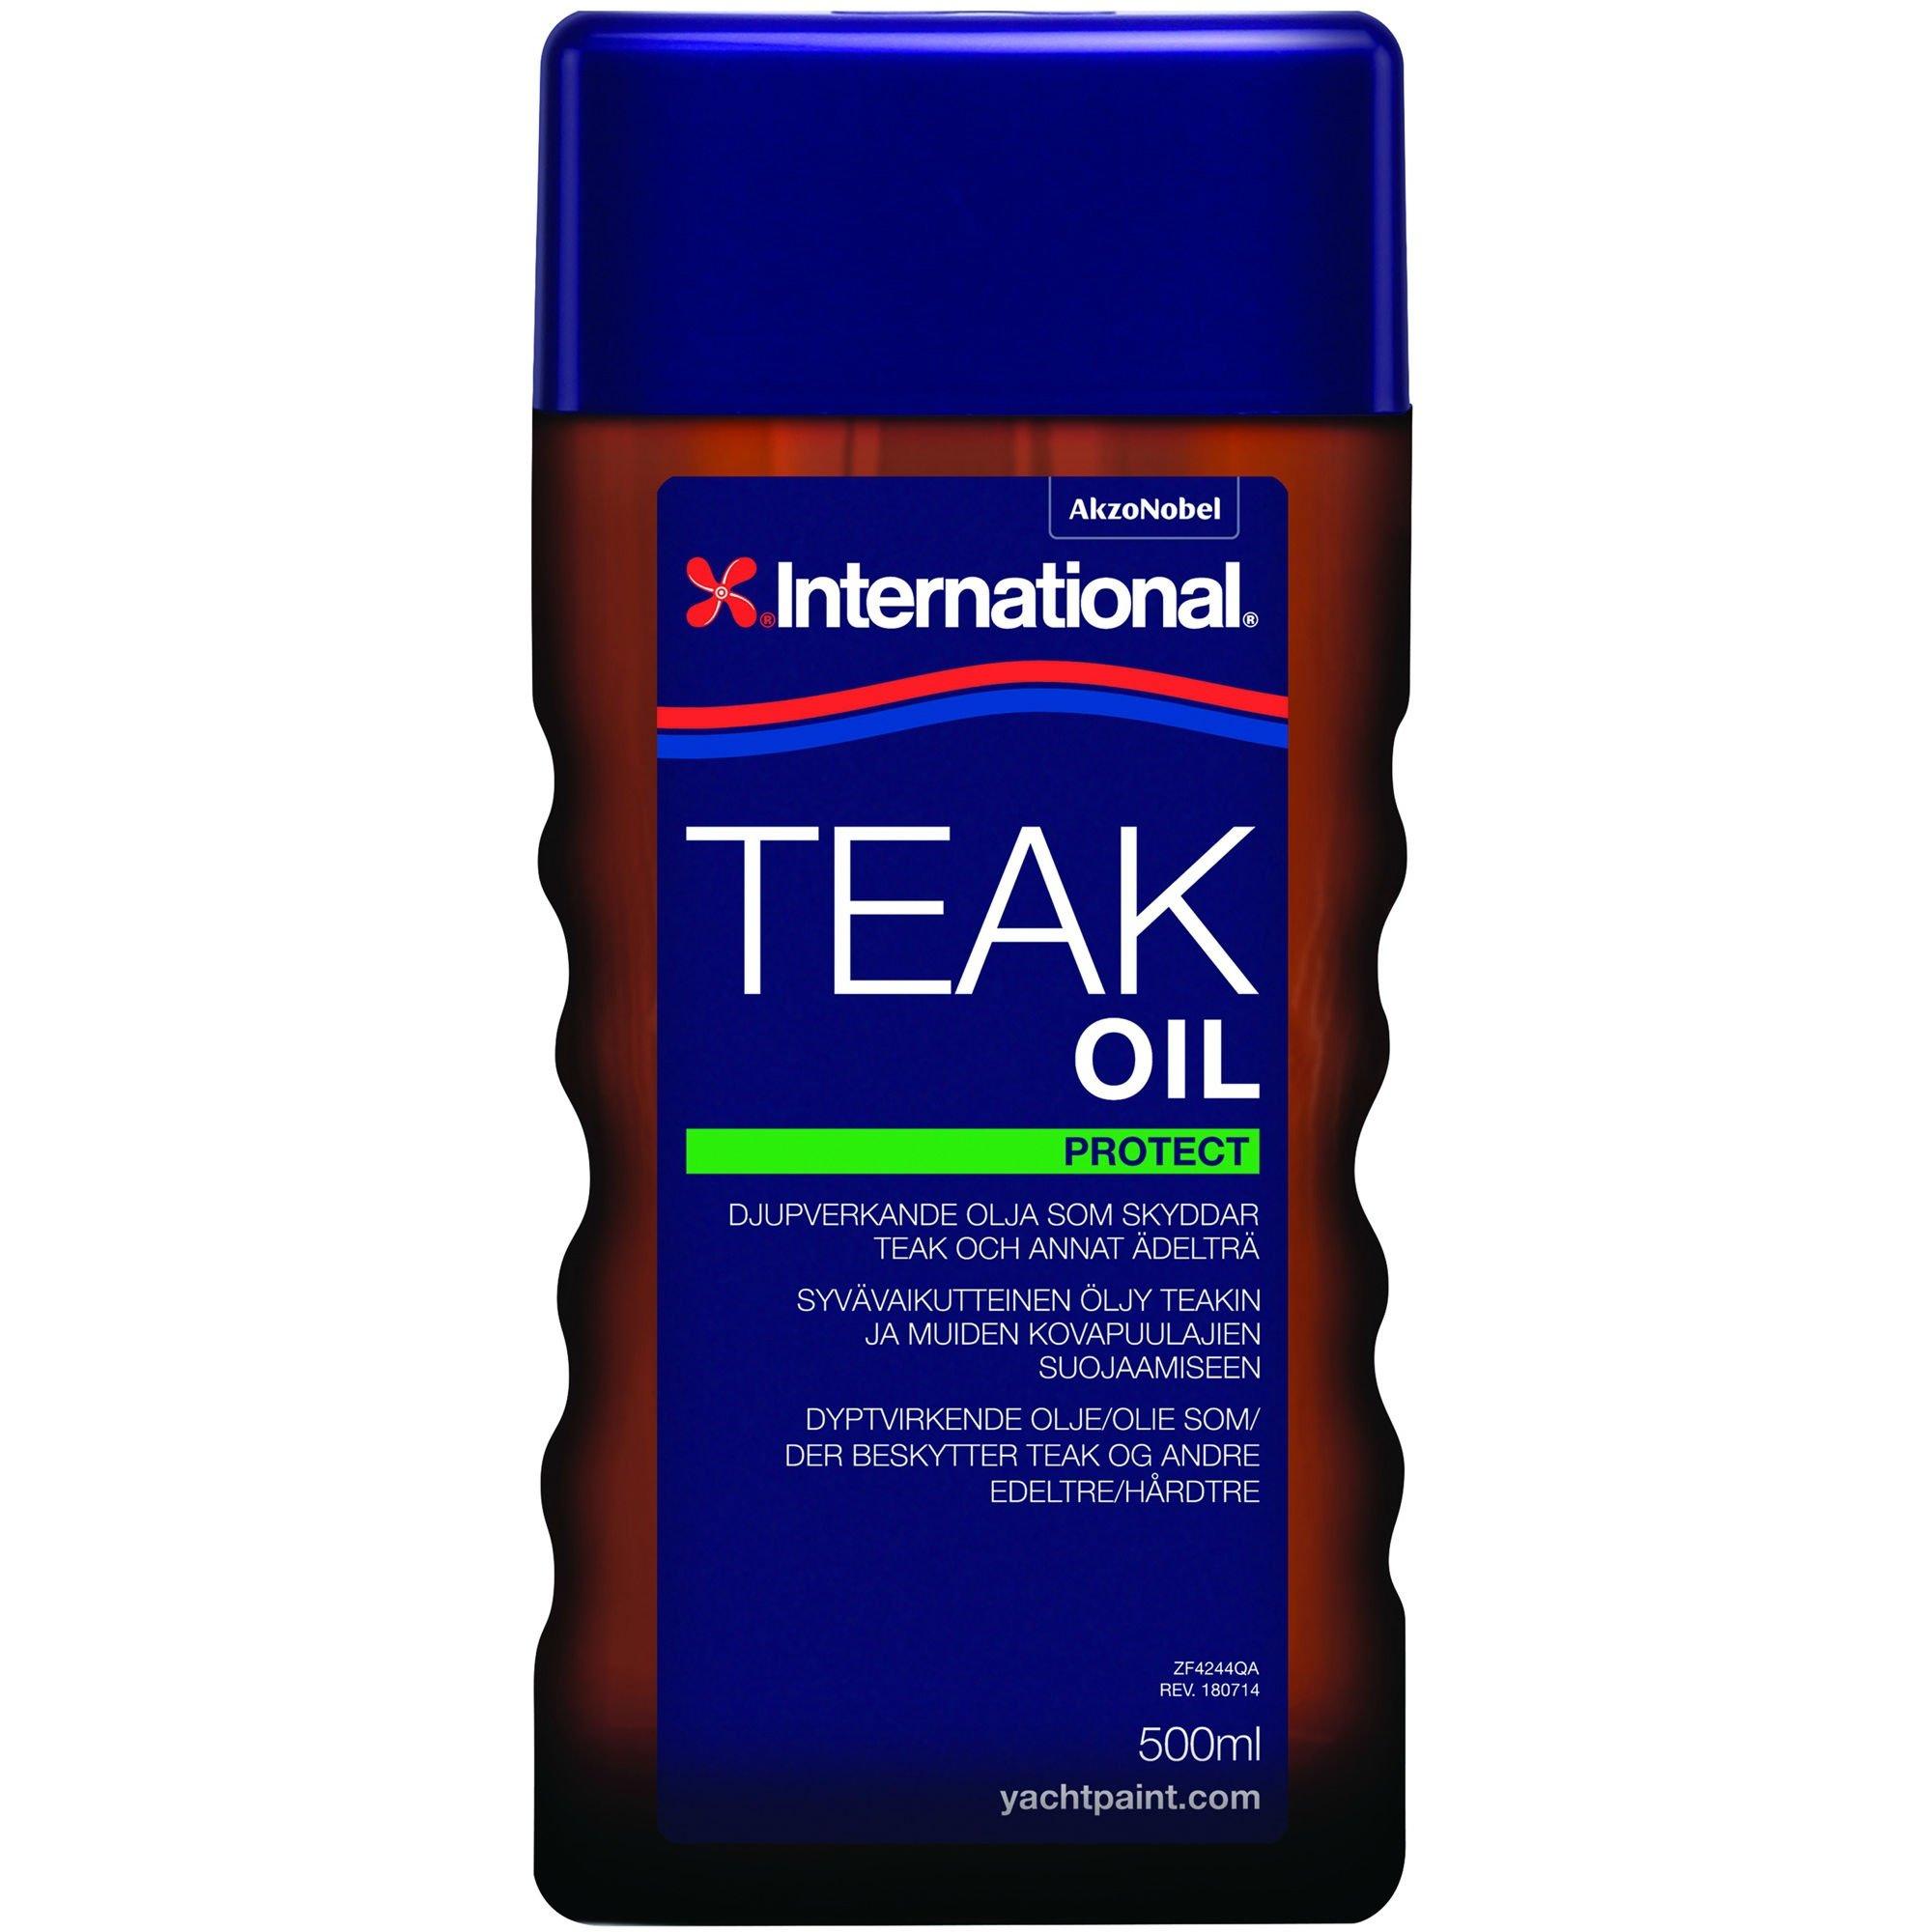 International teakolie-0,5 ltr